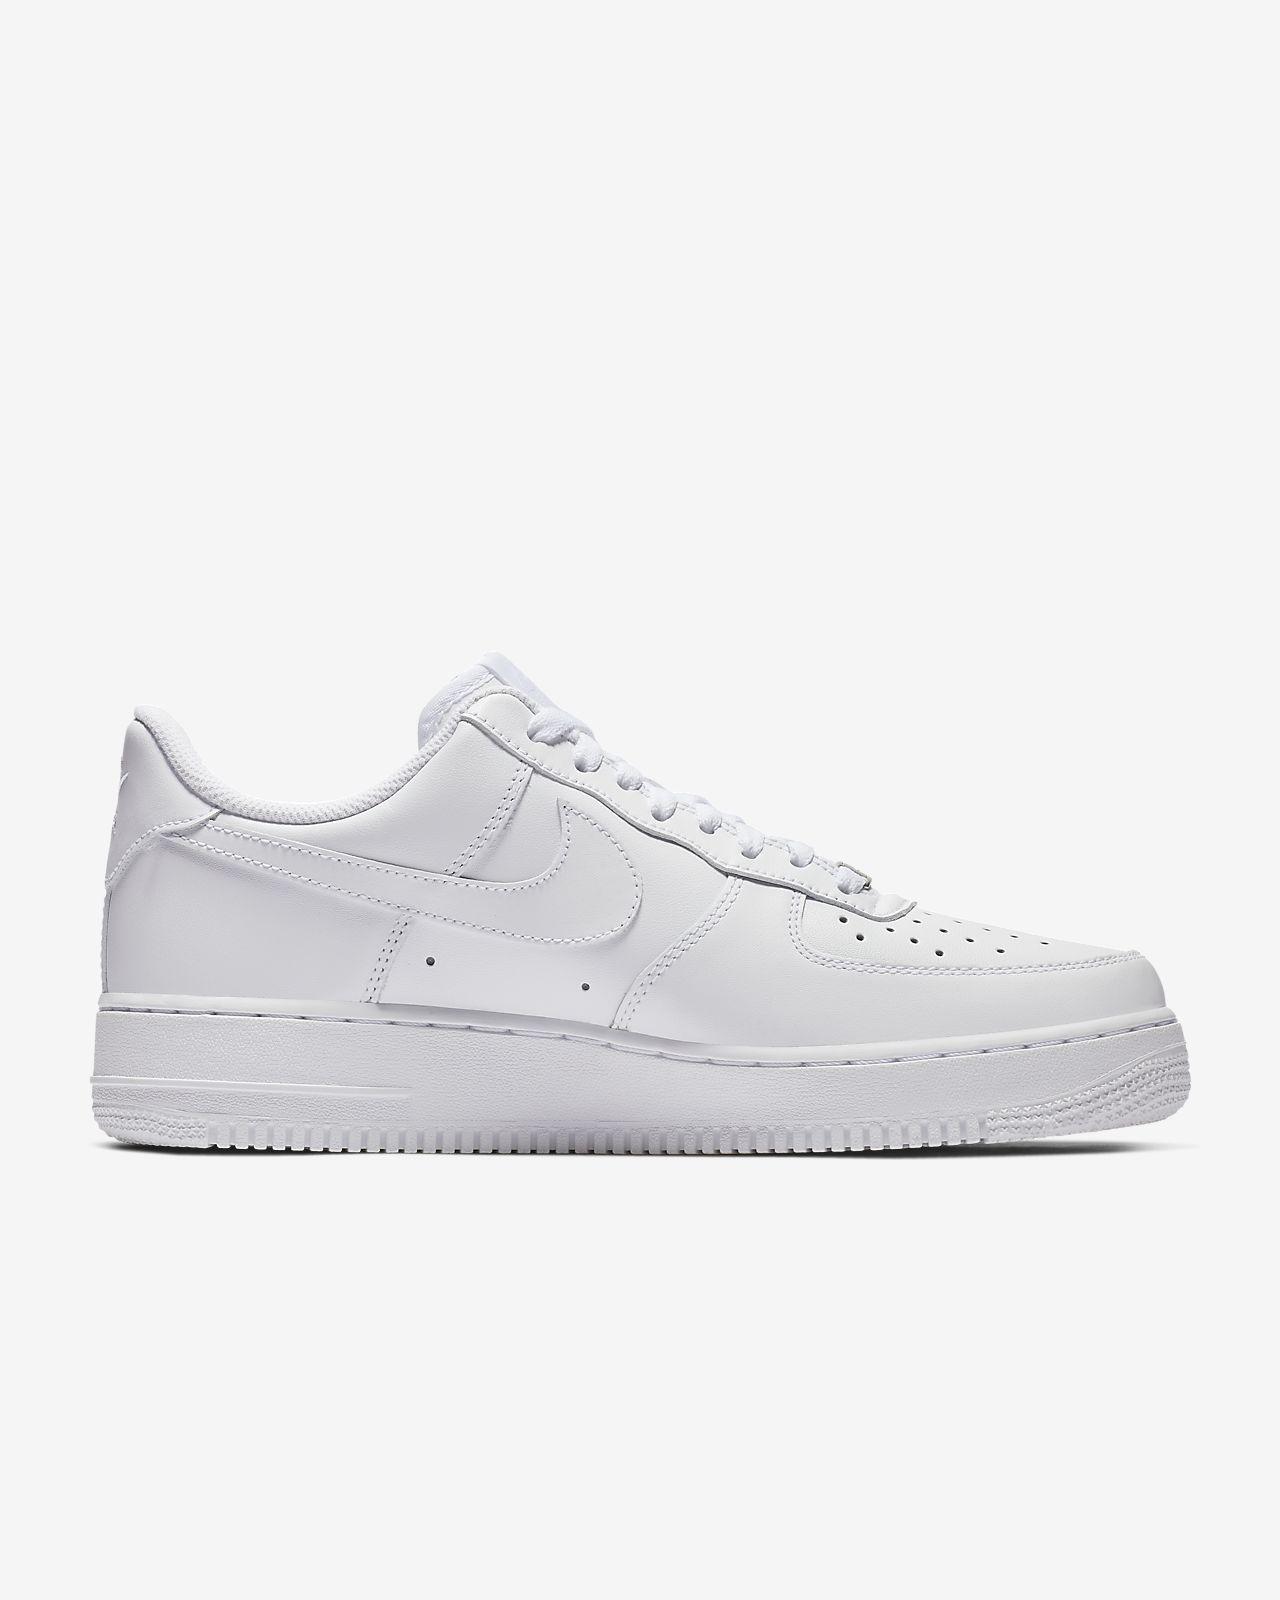 9875720e Nike Air Force 1 '07-sko til kvinder. Nike.com DK